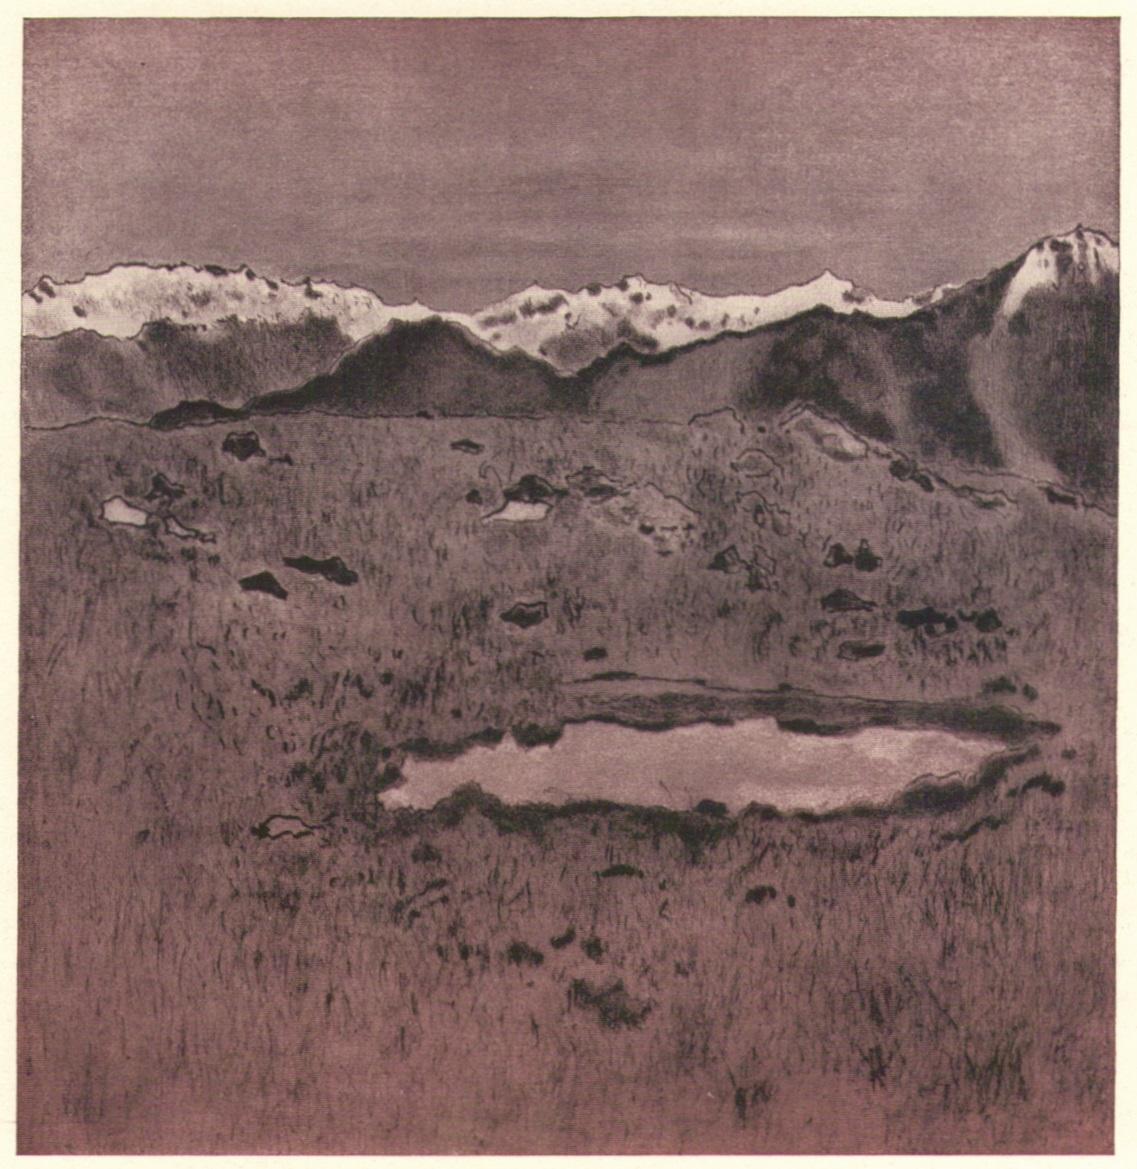 Hans Richard Heinmann - Herbstfriede Nebelhornkettep.jpg